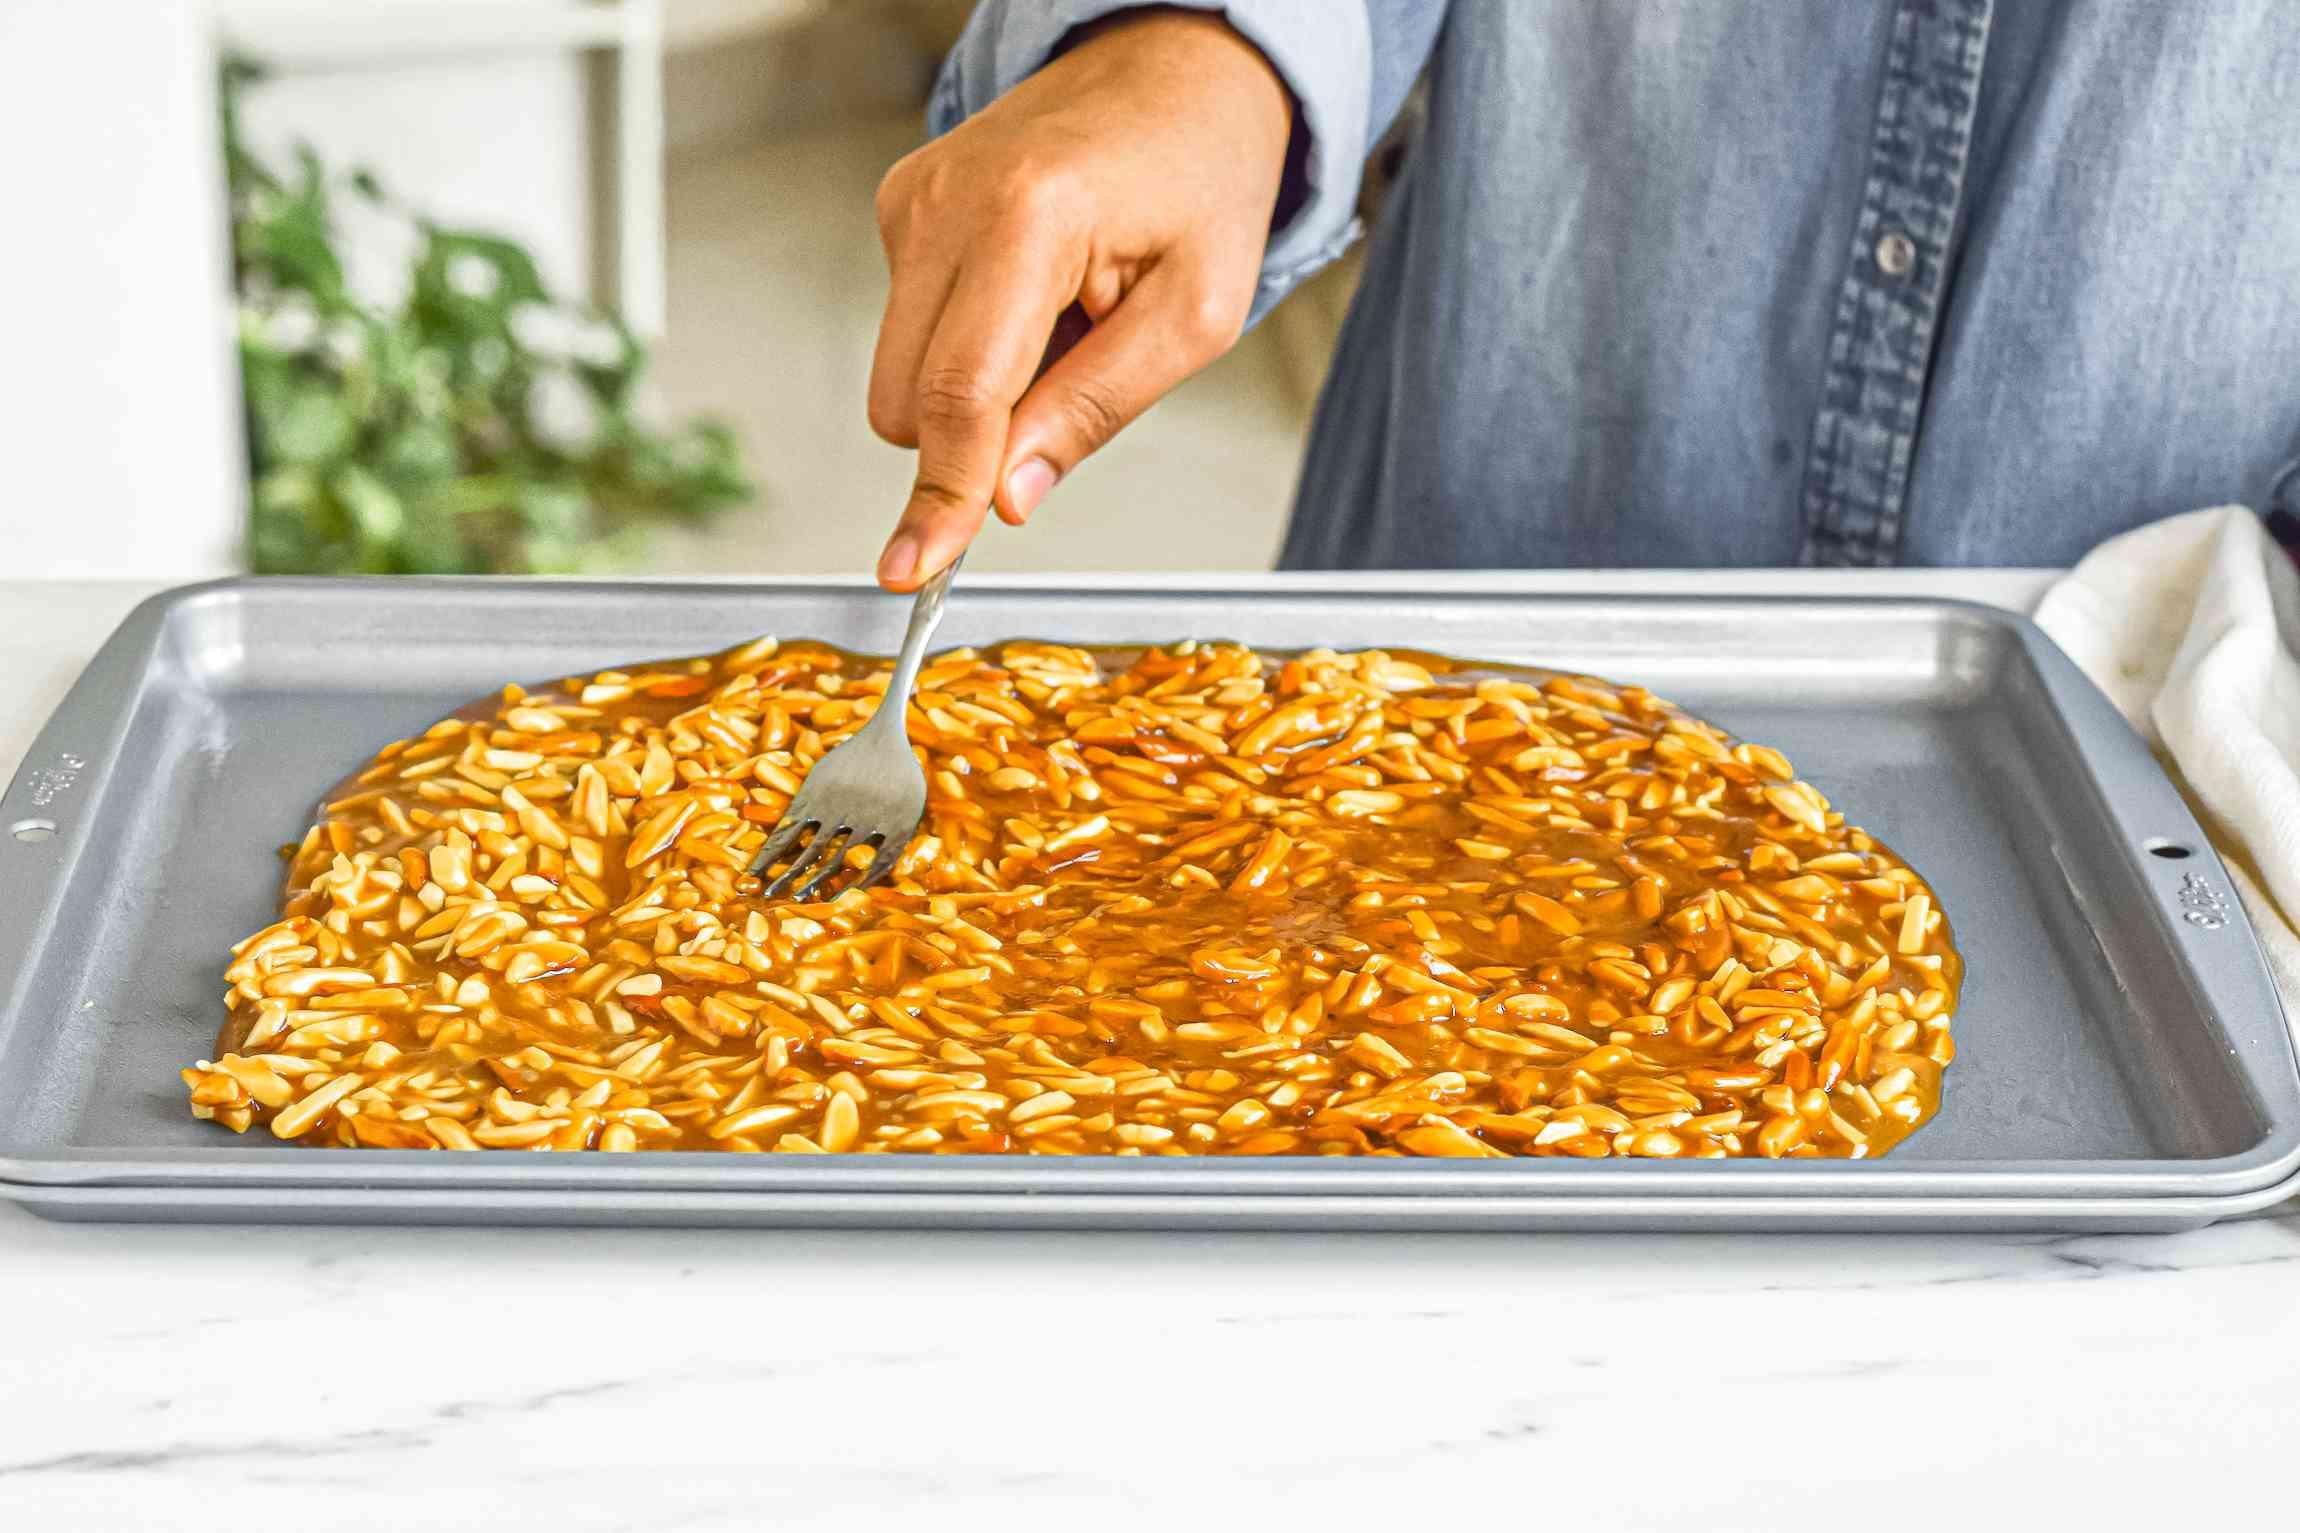 Spreading almond roca on a baking sheet.